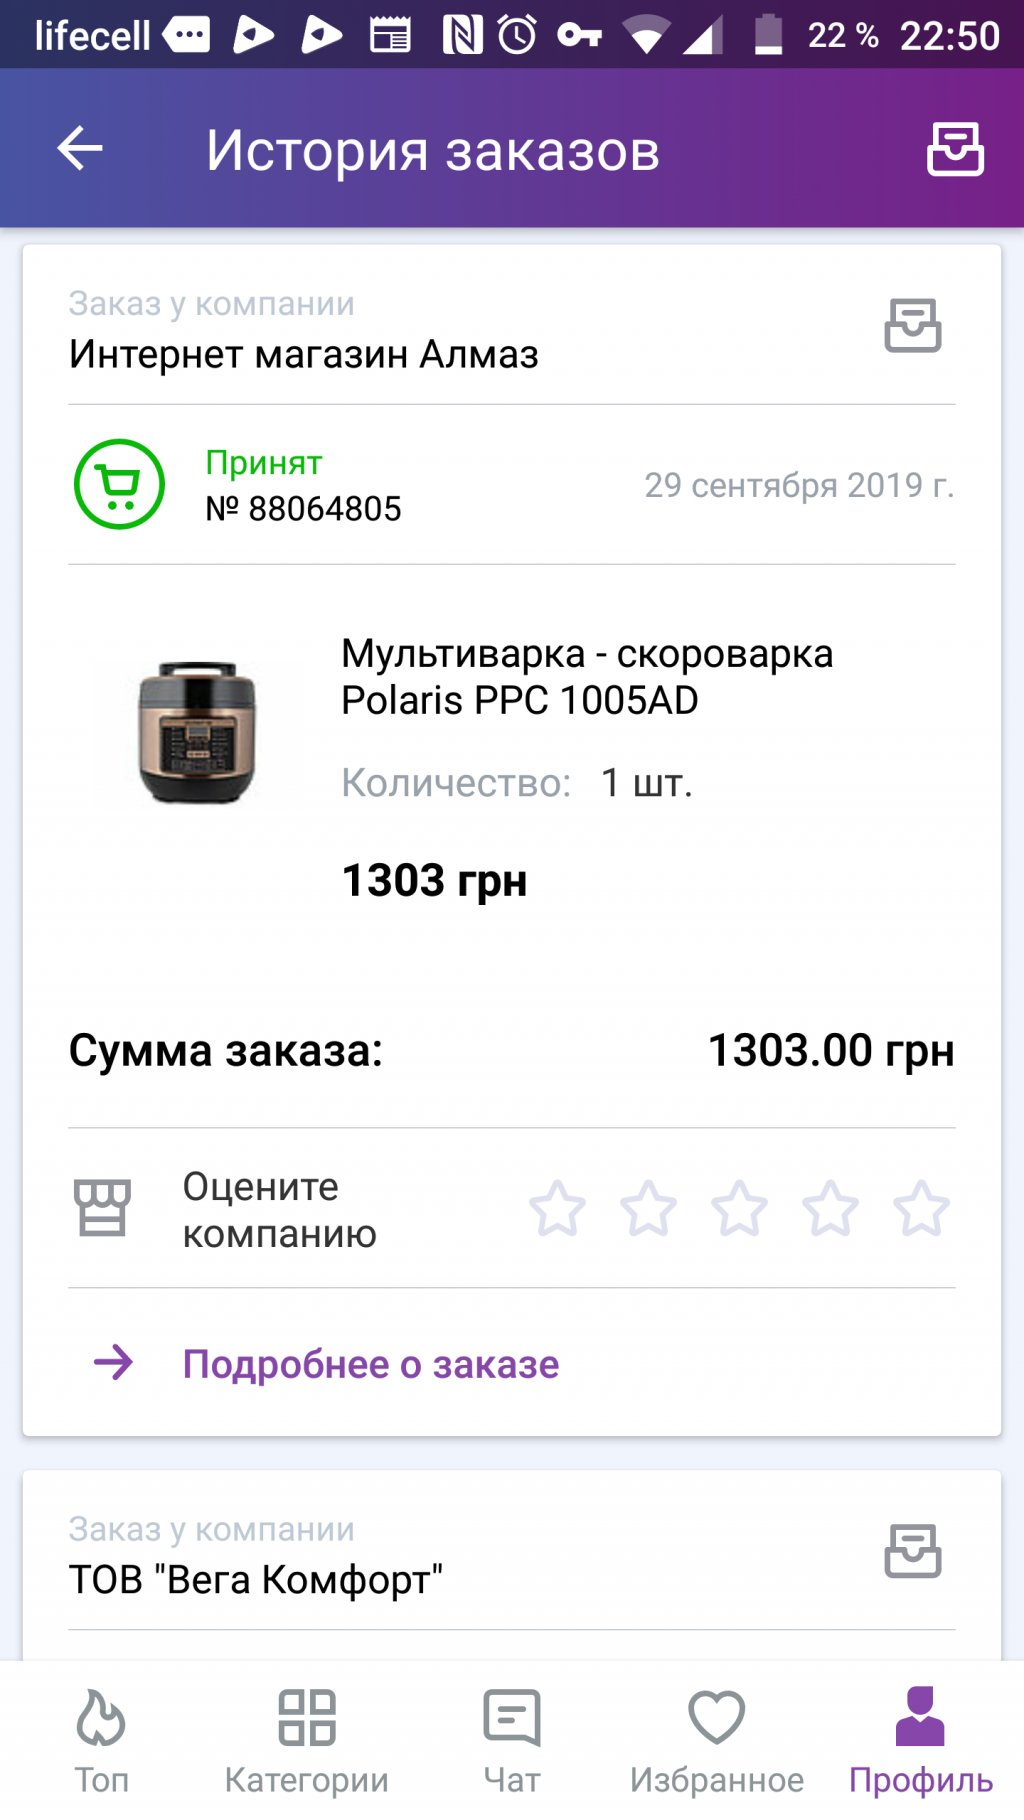 Prom.ua - Программа защиты покупателей